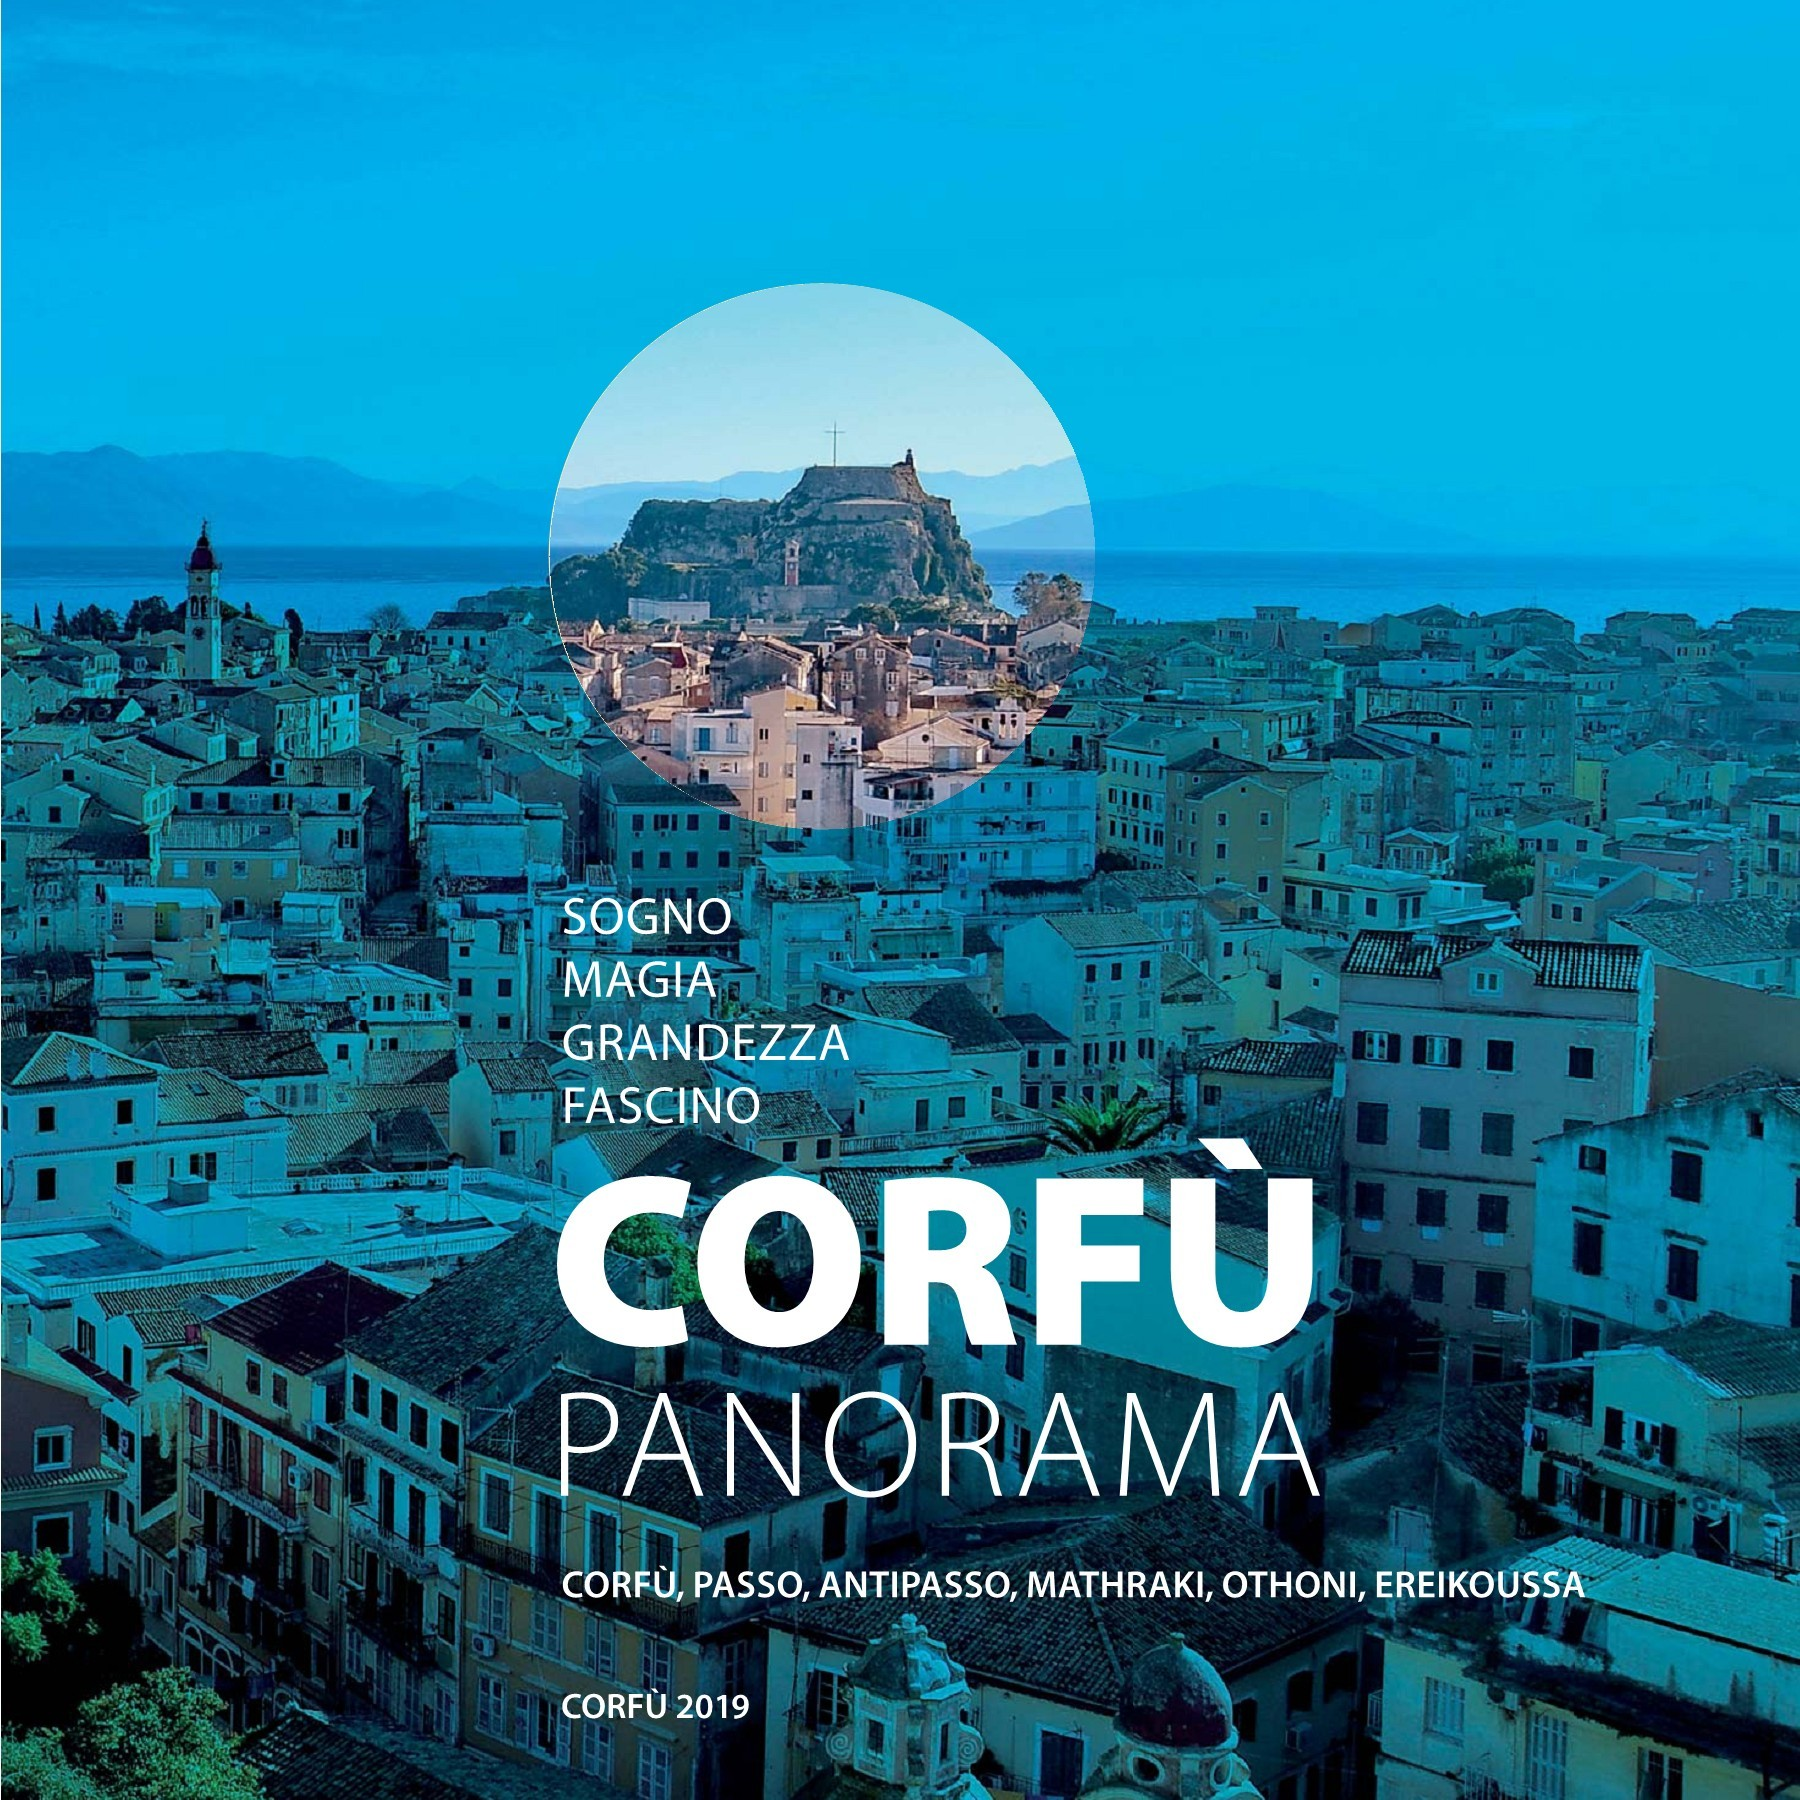 3 Corfu Panorama Italian 1 Flip Book Pages 1 50 Pubhtml5